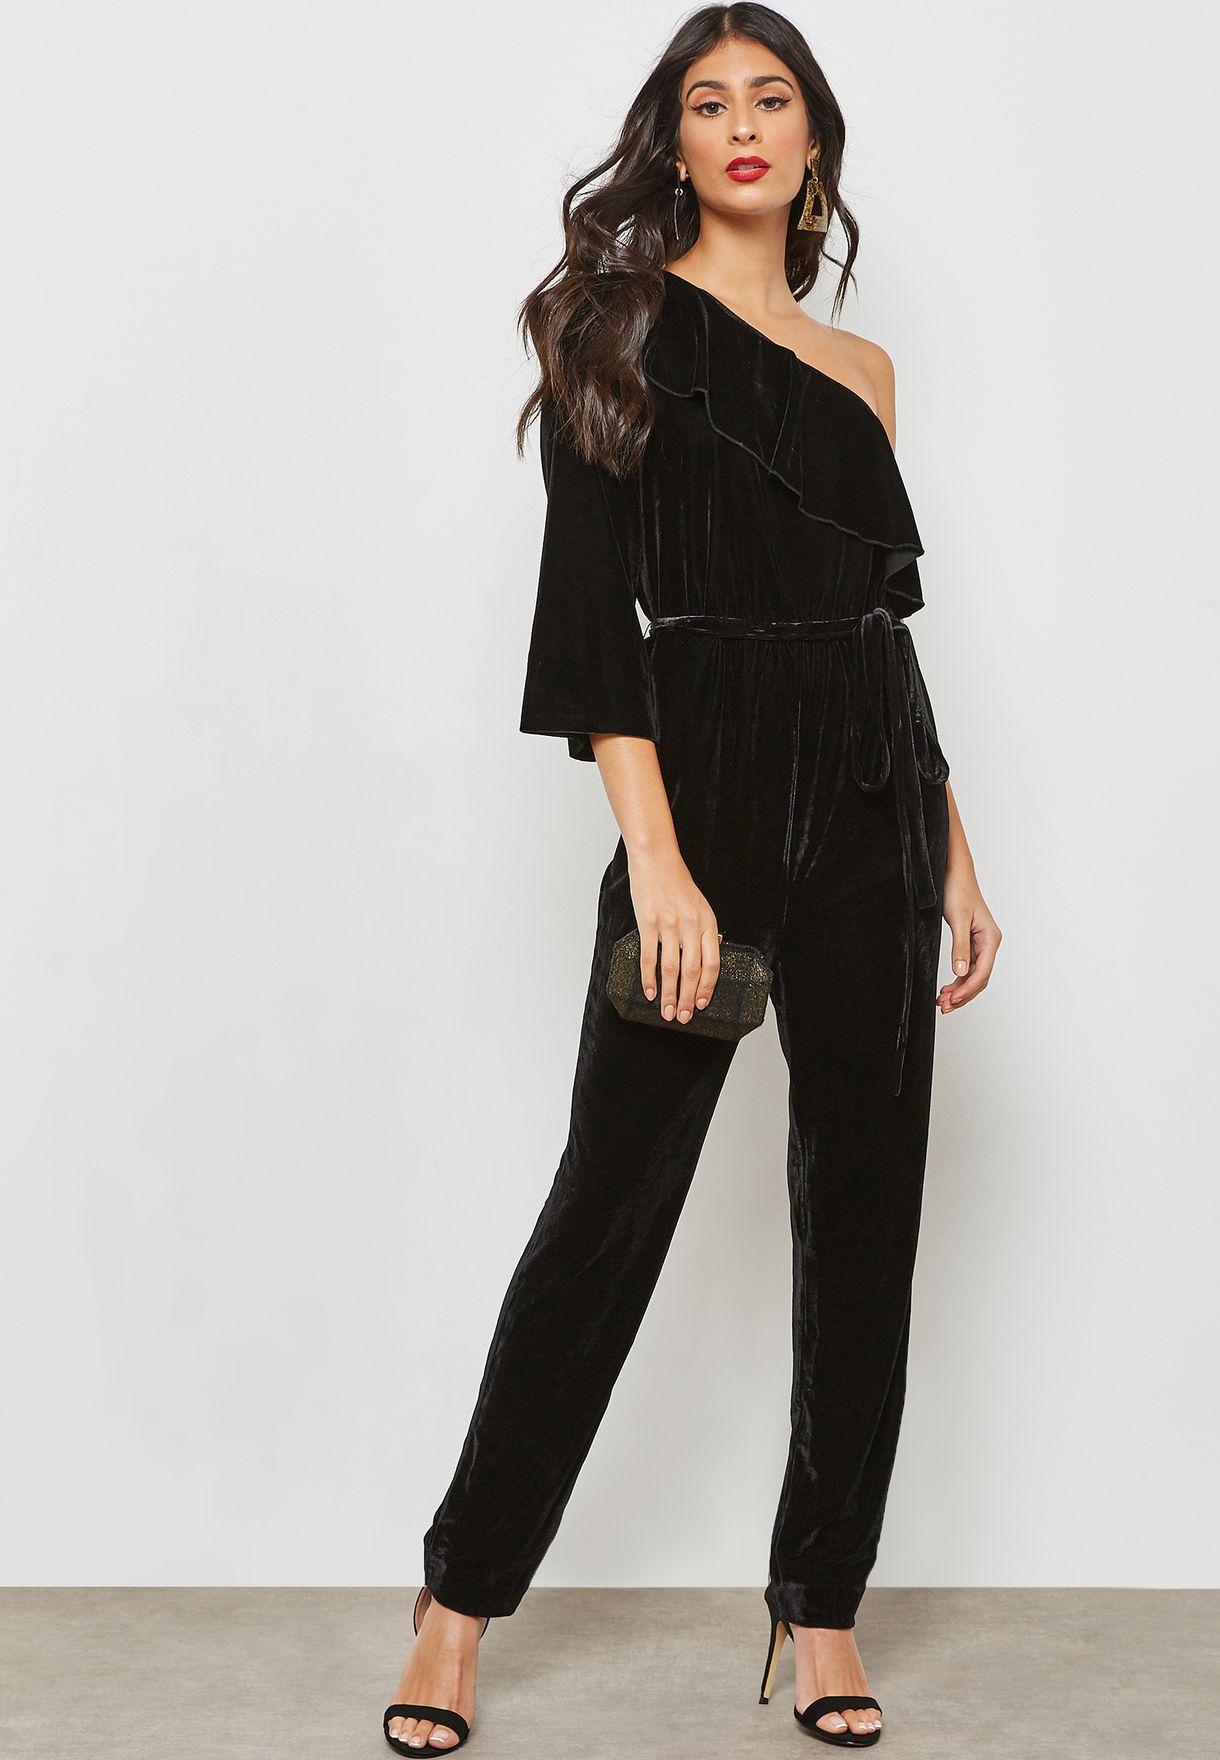 a1a031739e Shop Ginger black Ruffle One Shoulder Velvet Jumpsuit V114 for Women ...